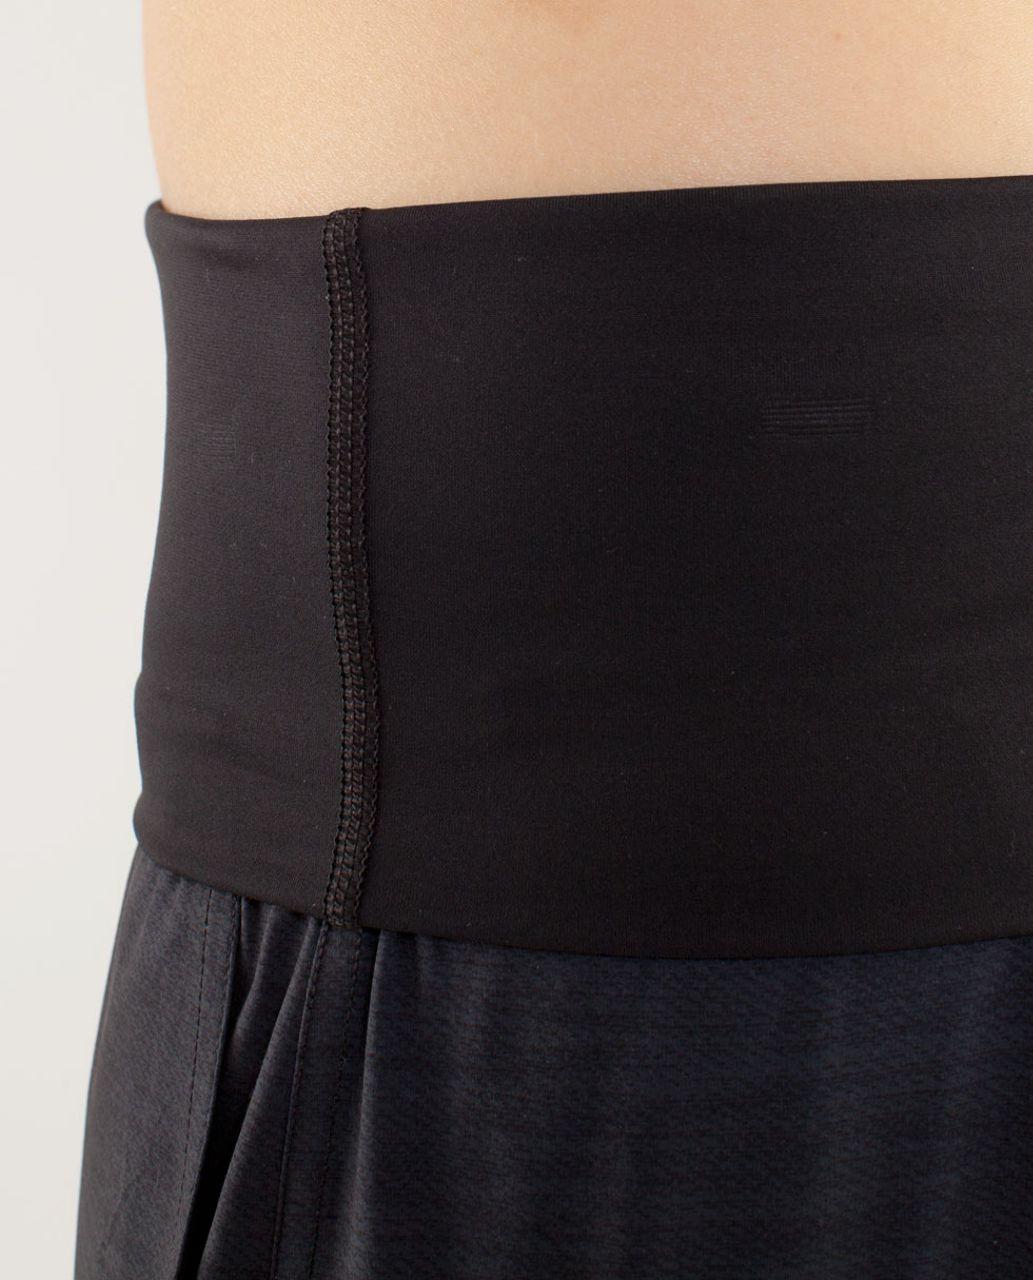 Lululemon Om Pant - Commuter Denim Black / Black